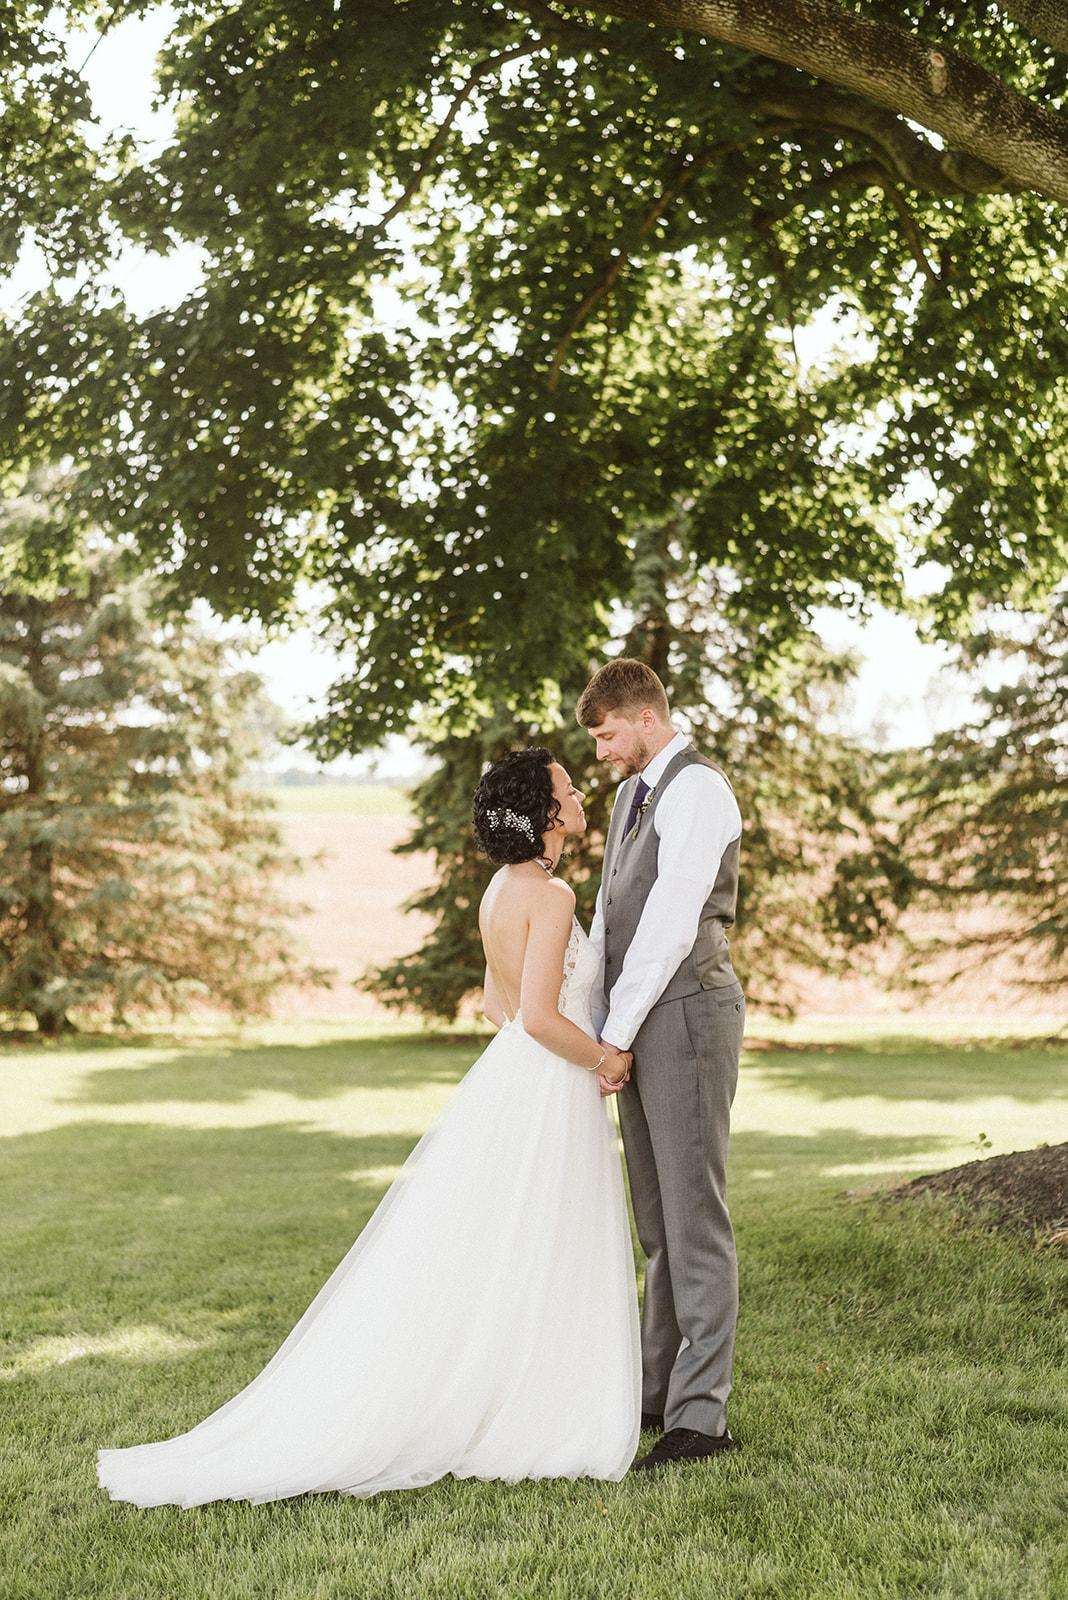 Stocks Manor Lancaster PA Wedding Photographer